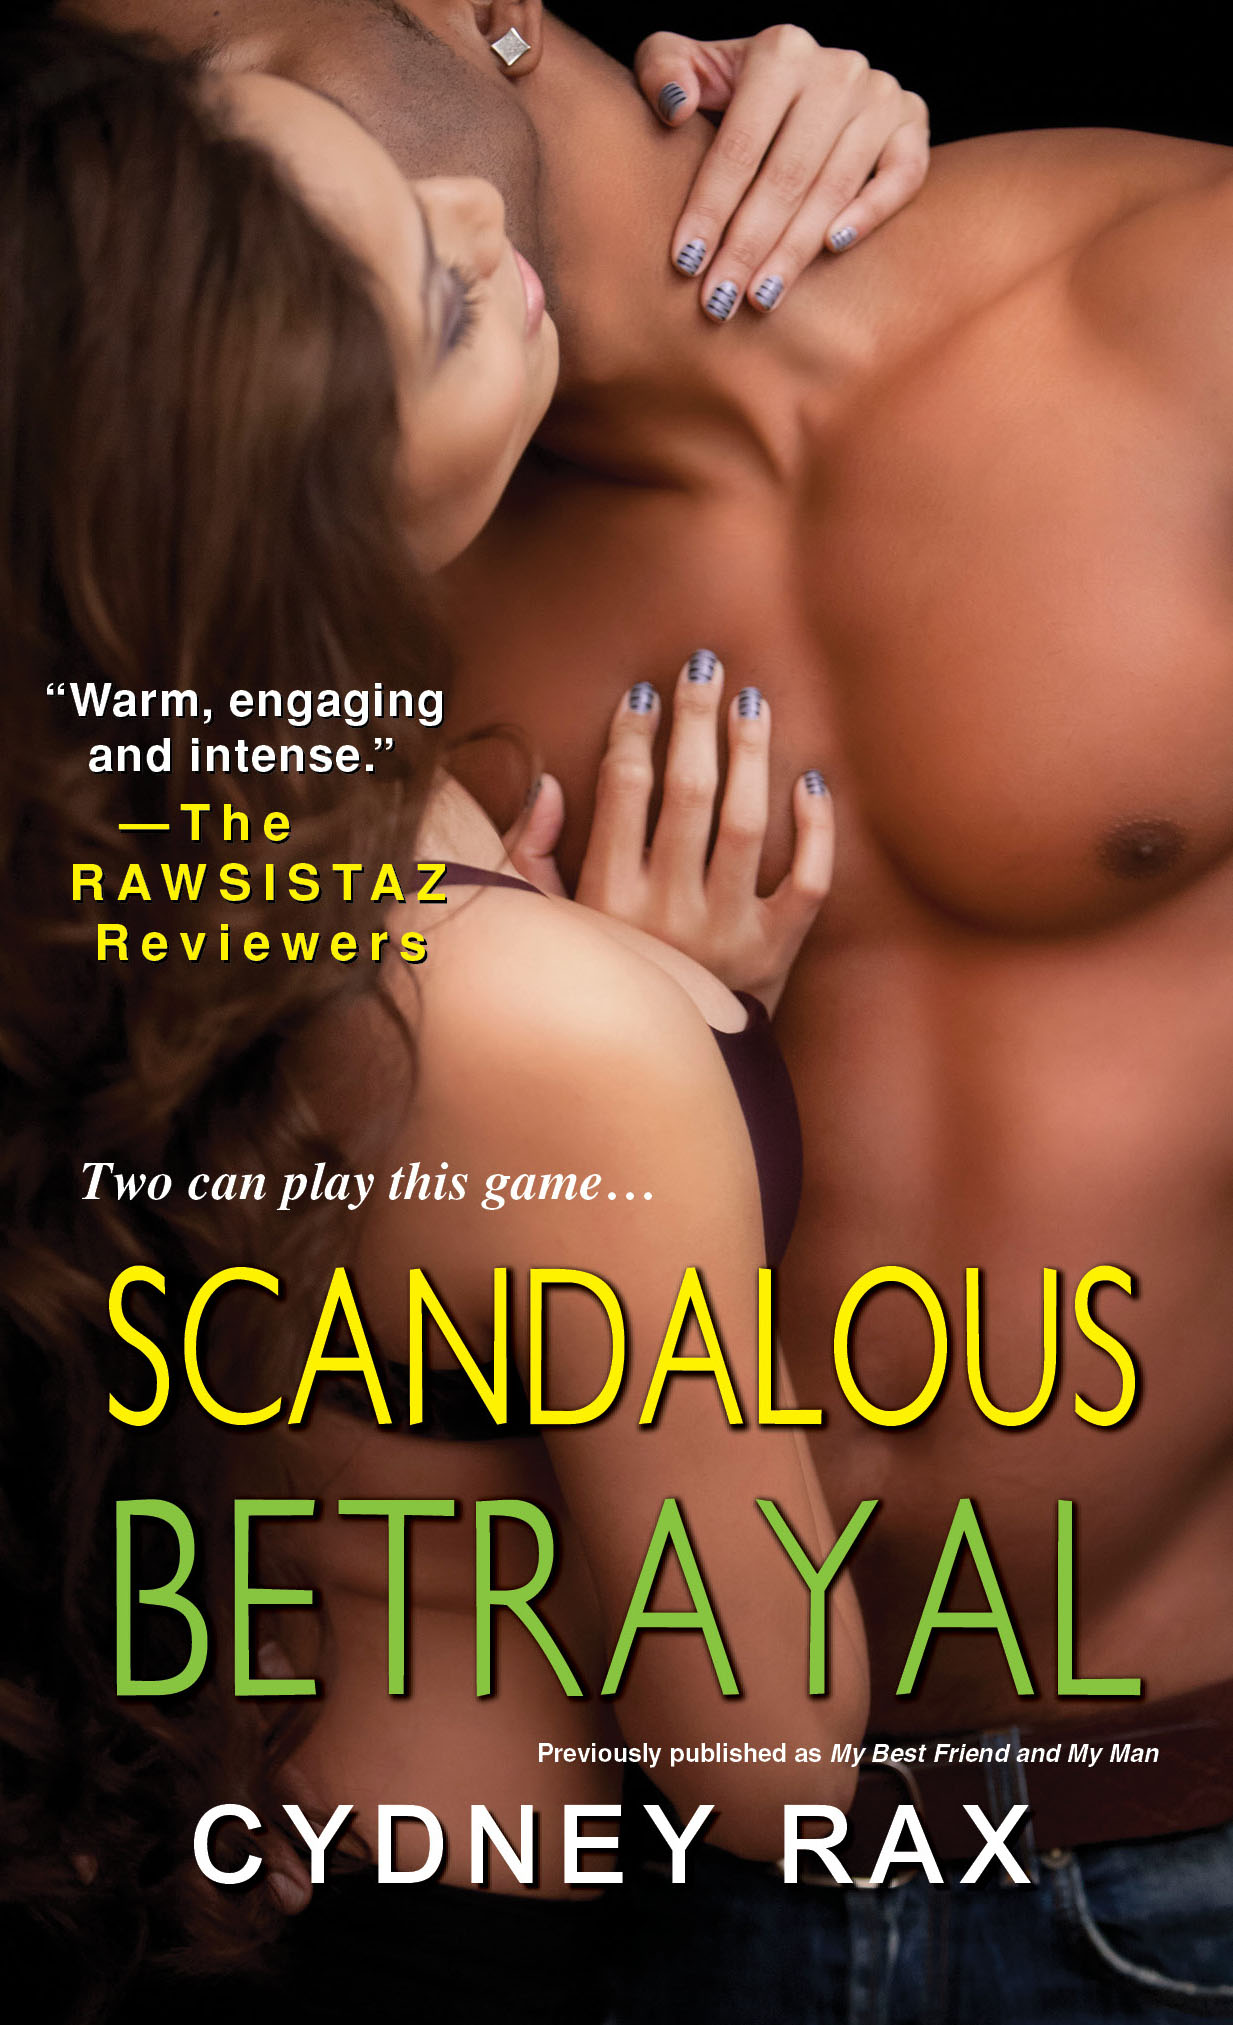 Scandalous_Betrayal